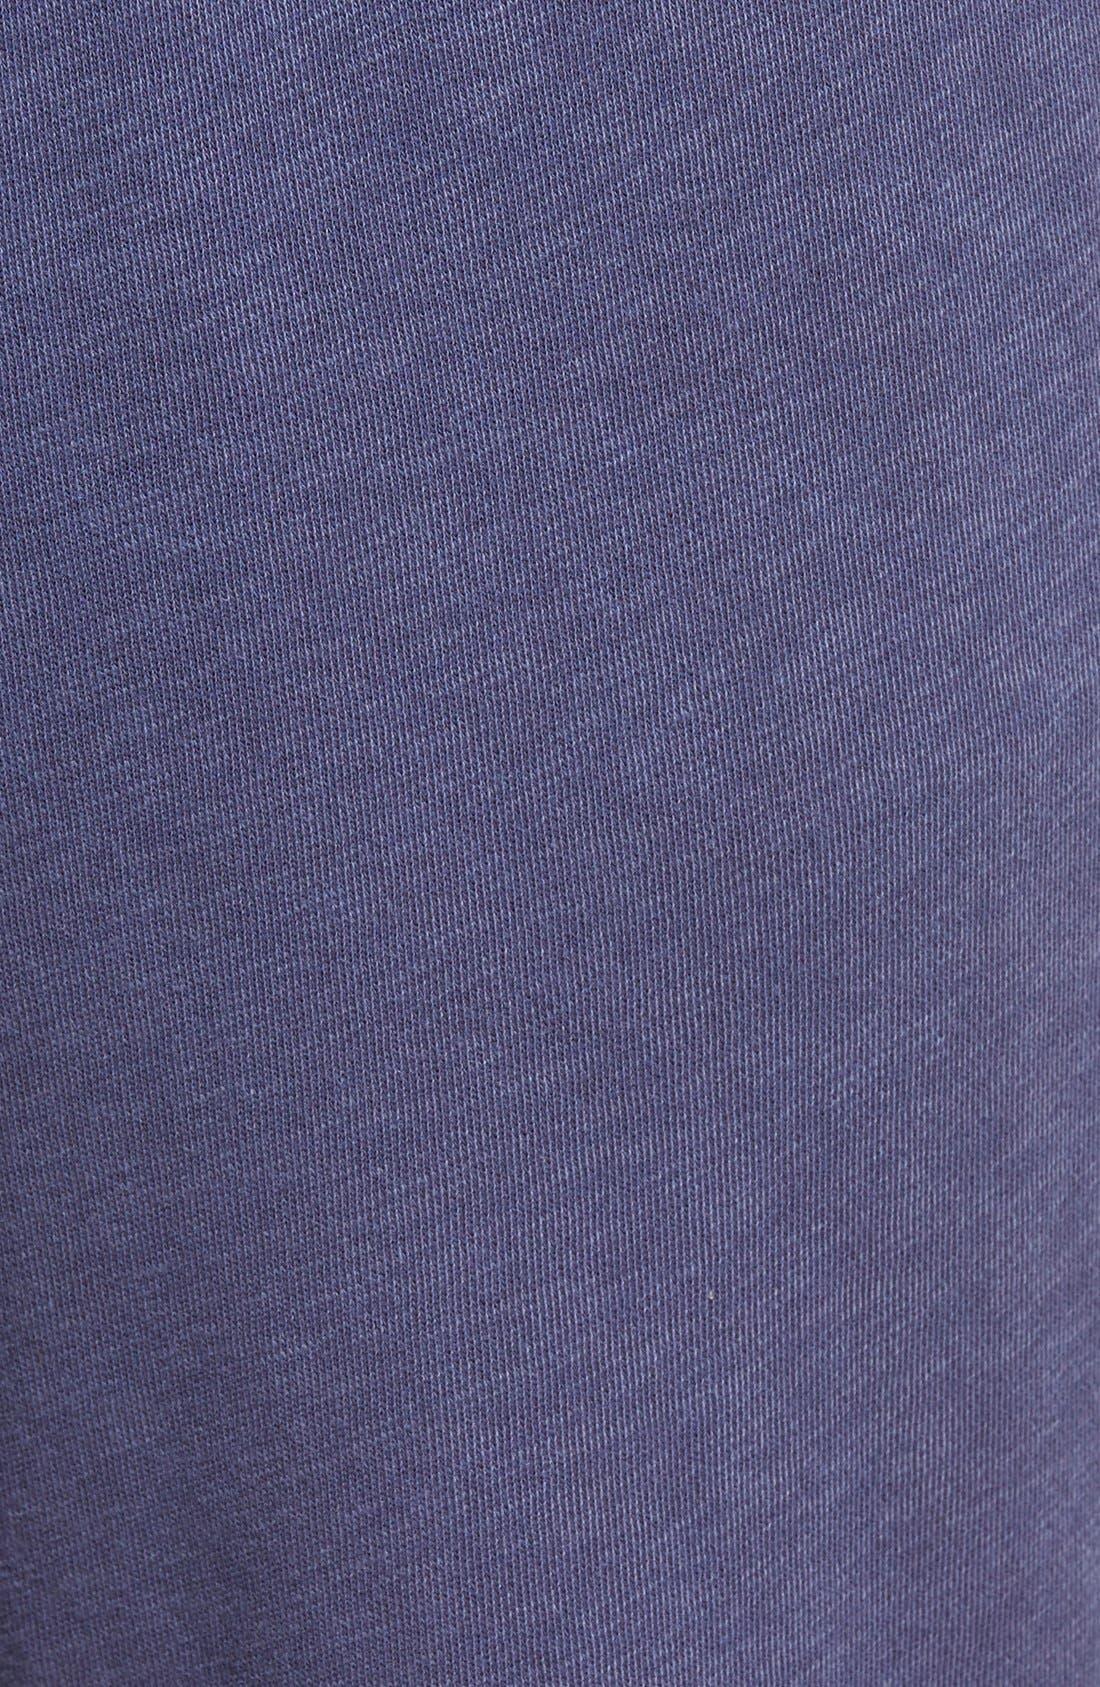 'Classic' Sweatpants,                             Alternate thumbnail 42, color,